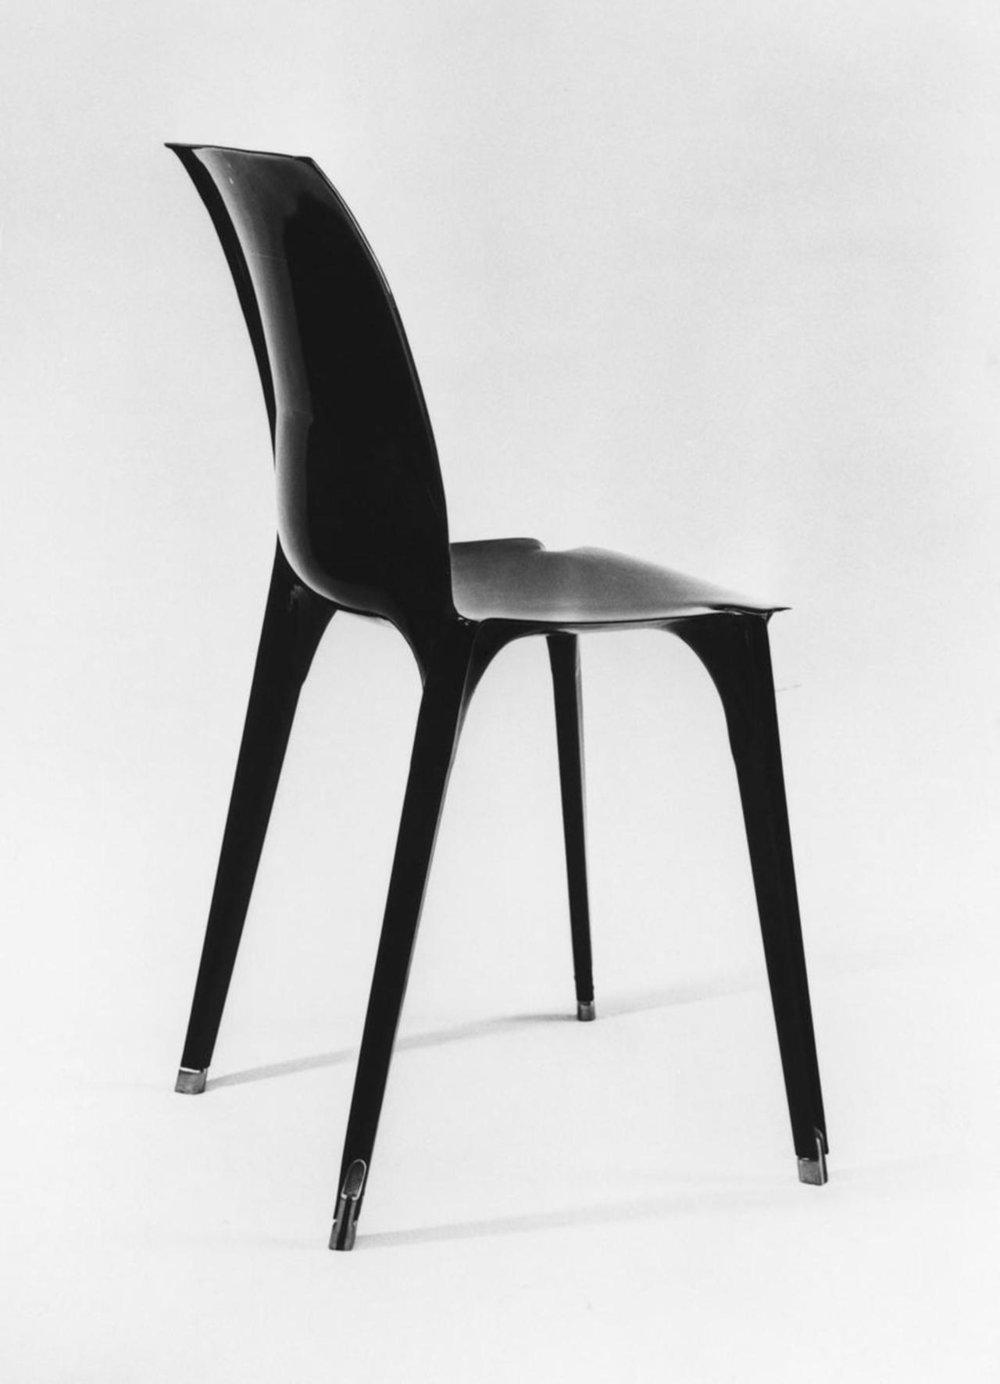 Lambda Chair by Marco Zanuso and Richard Sapper, 1963. Photo via richardsapperdesign.com .